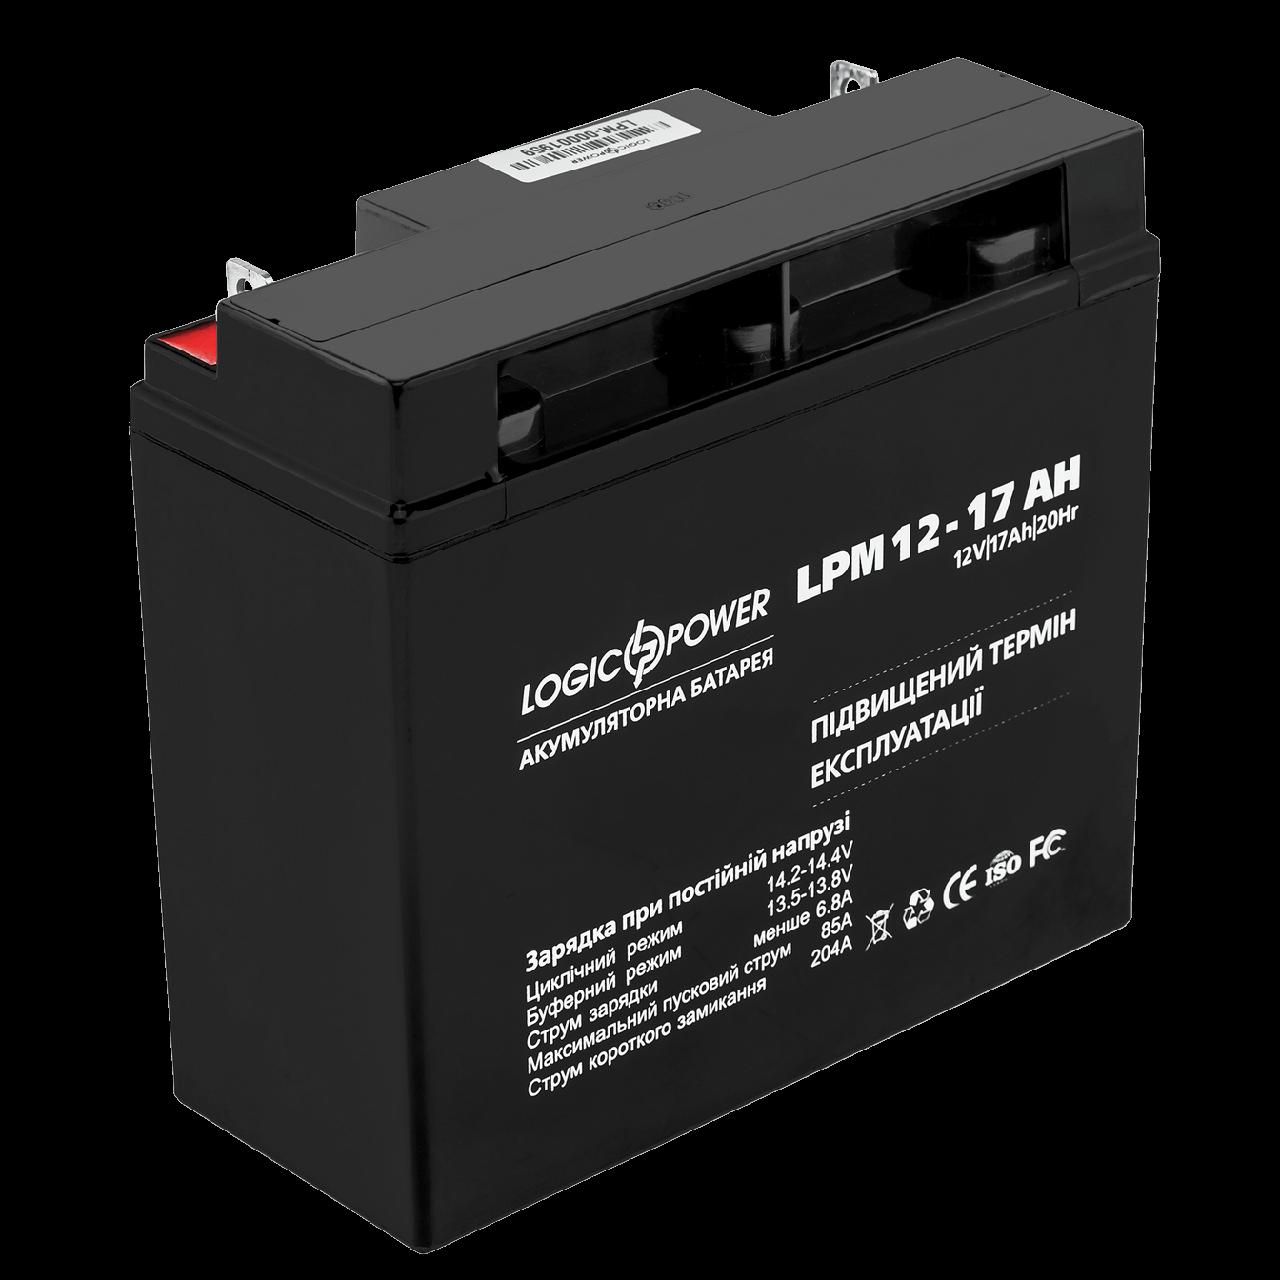 Аккумулятор свинцово-кислотный LogicPower AGM LPM 12 - 17 AH